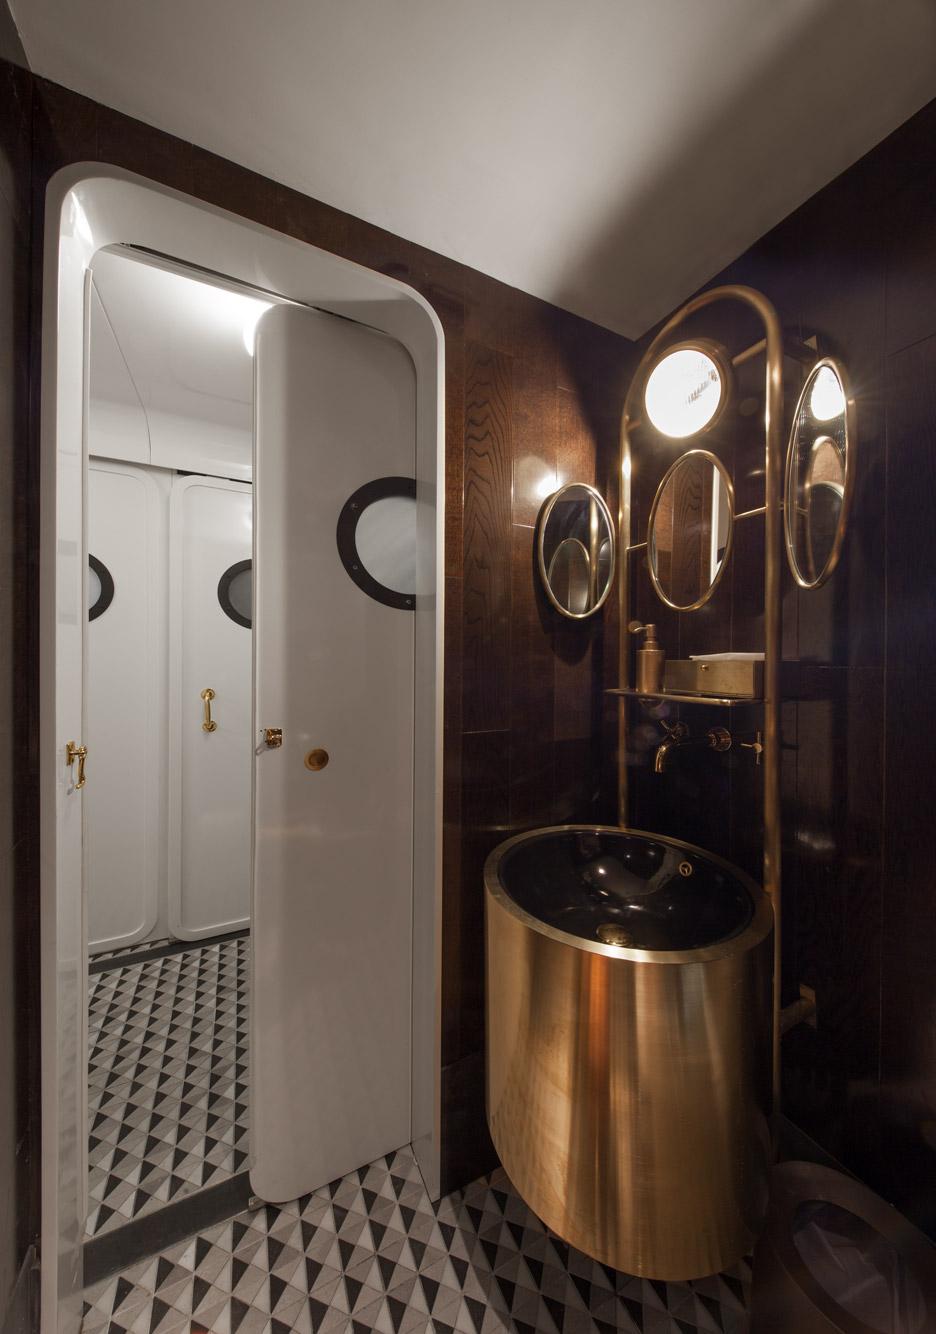 Architecture-shop-umbrellas-design-studia-interiors-osnovadesign-osnova-poltava-10